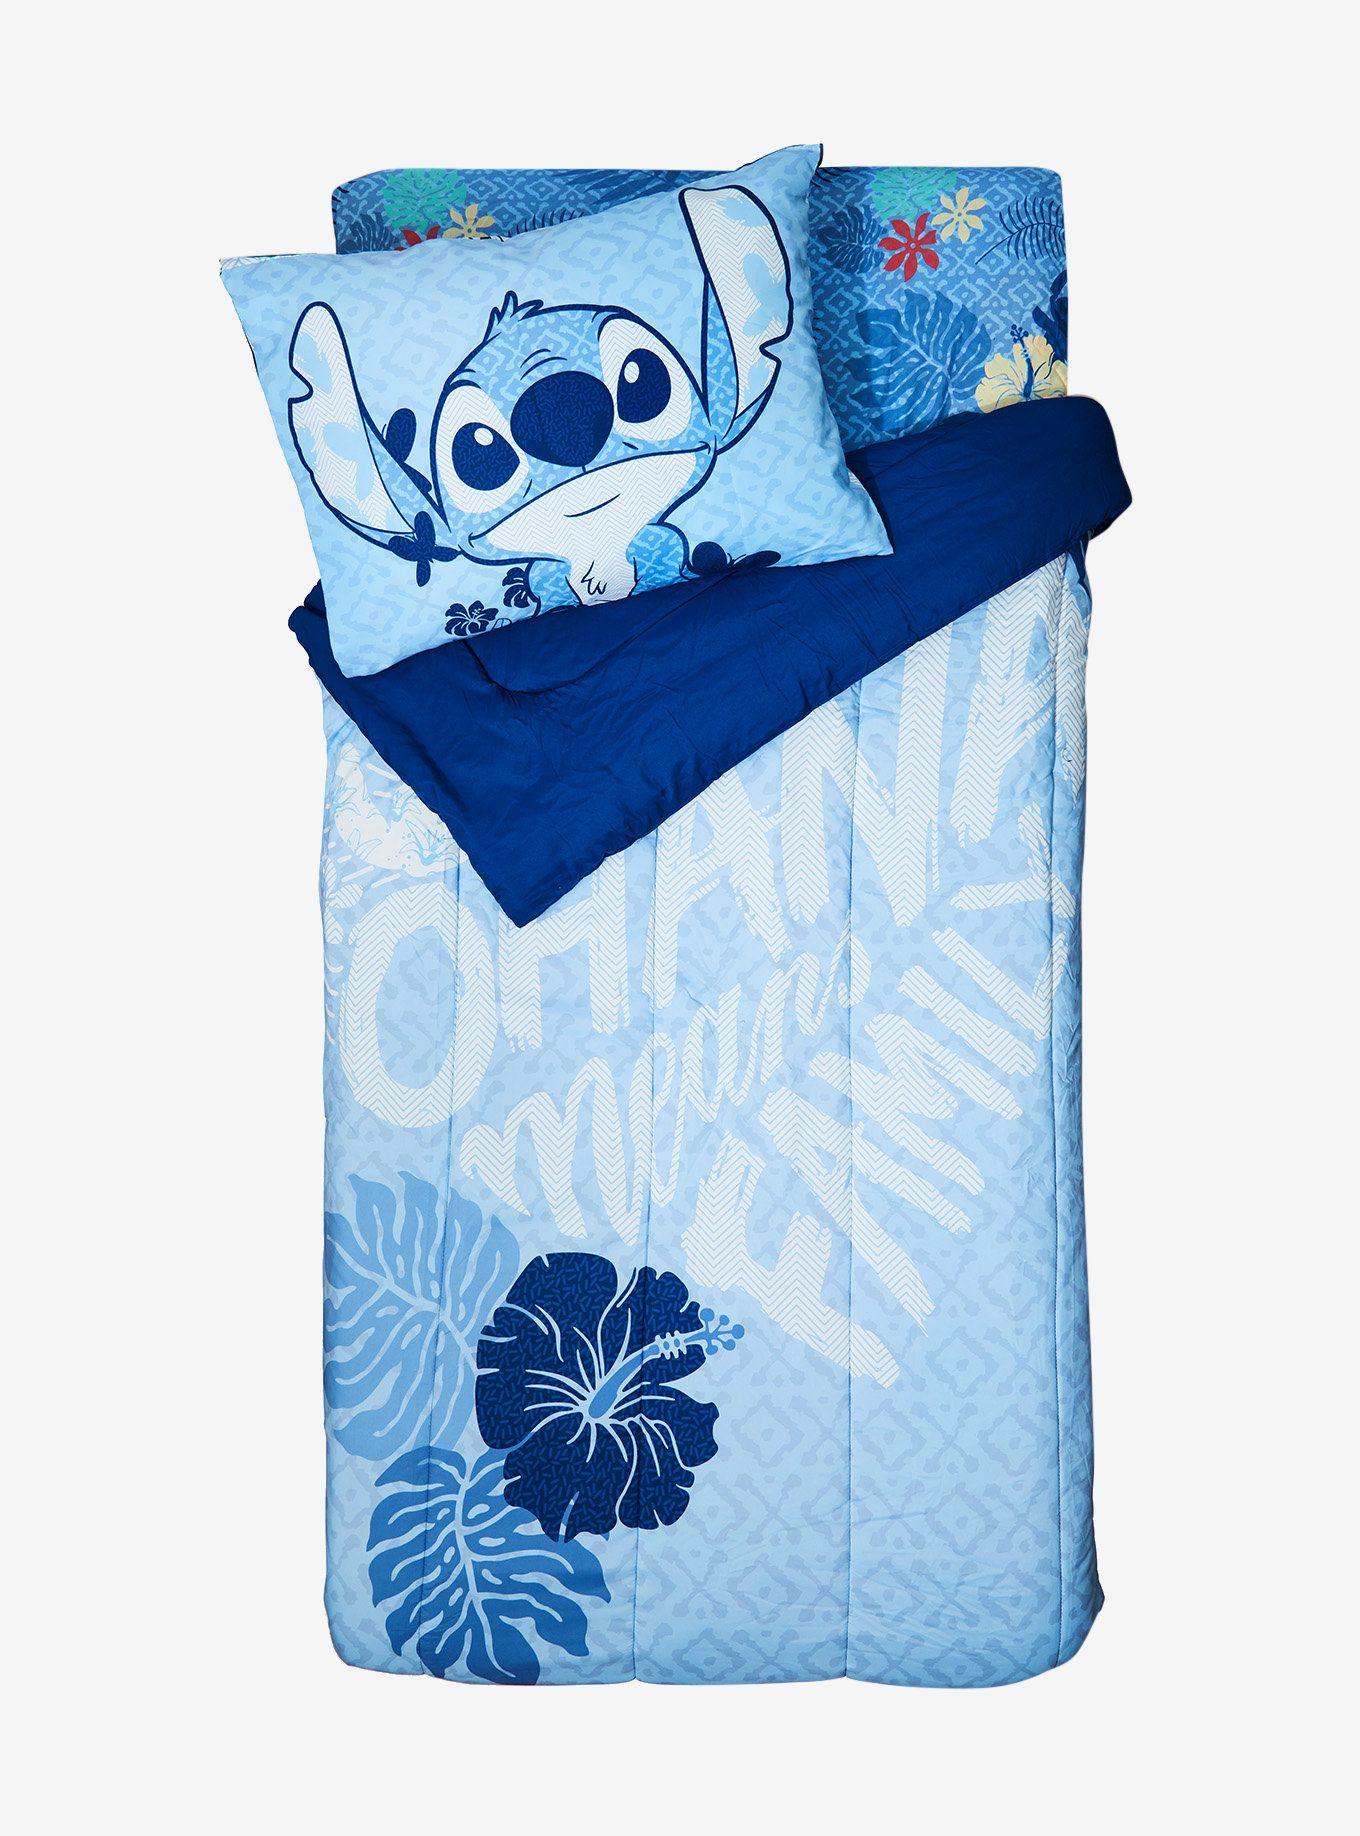 Disney Lilo & Stitch Tropical Twin XL Sheet Set | Disney tidbits